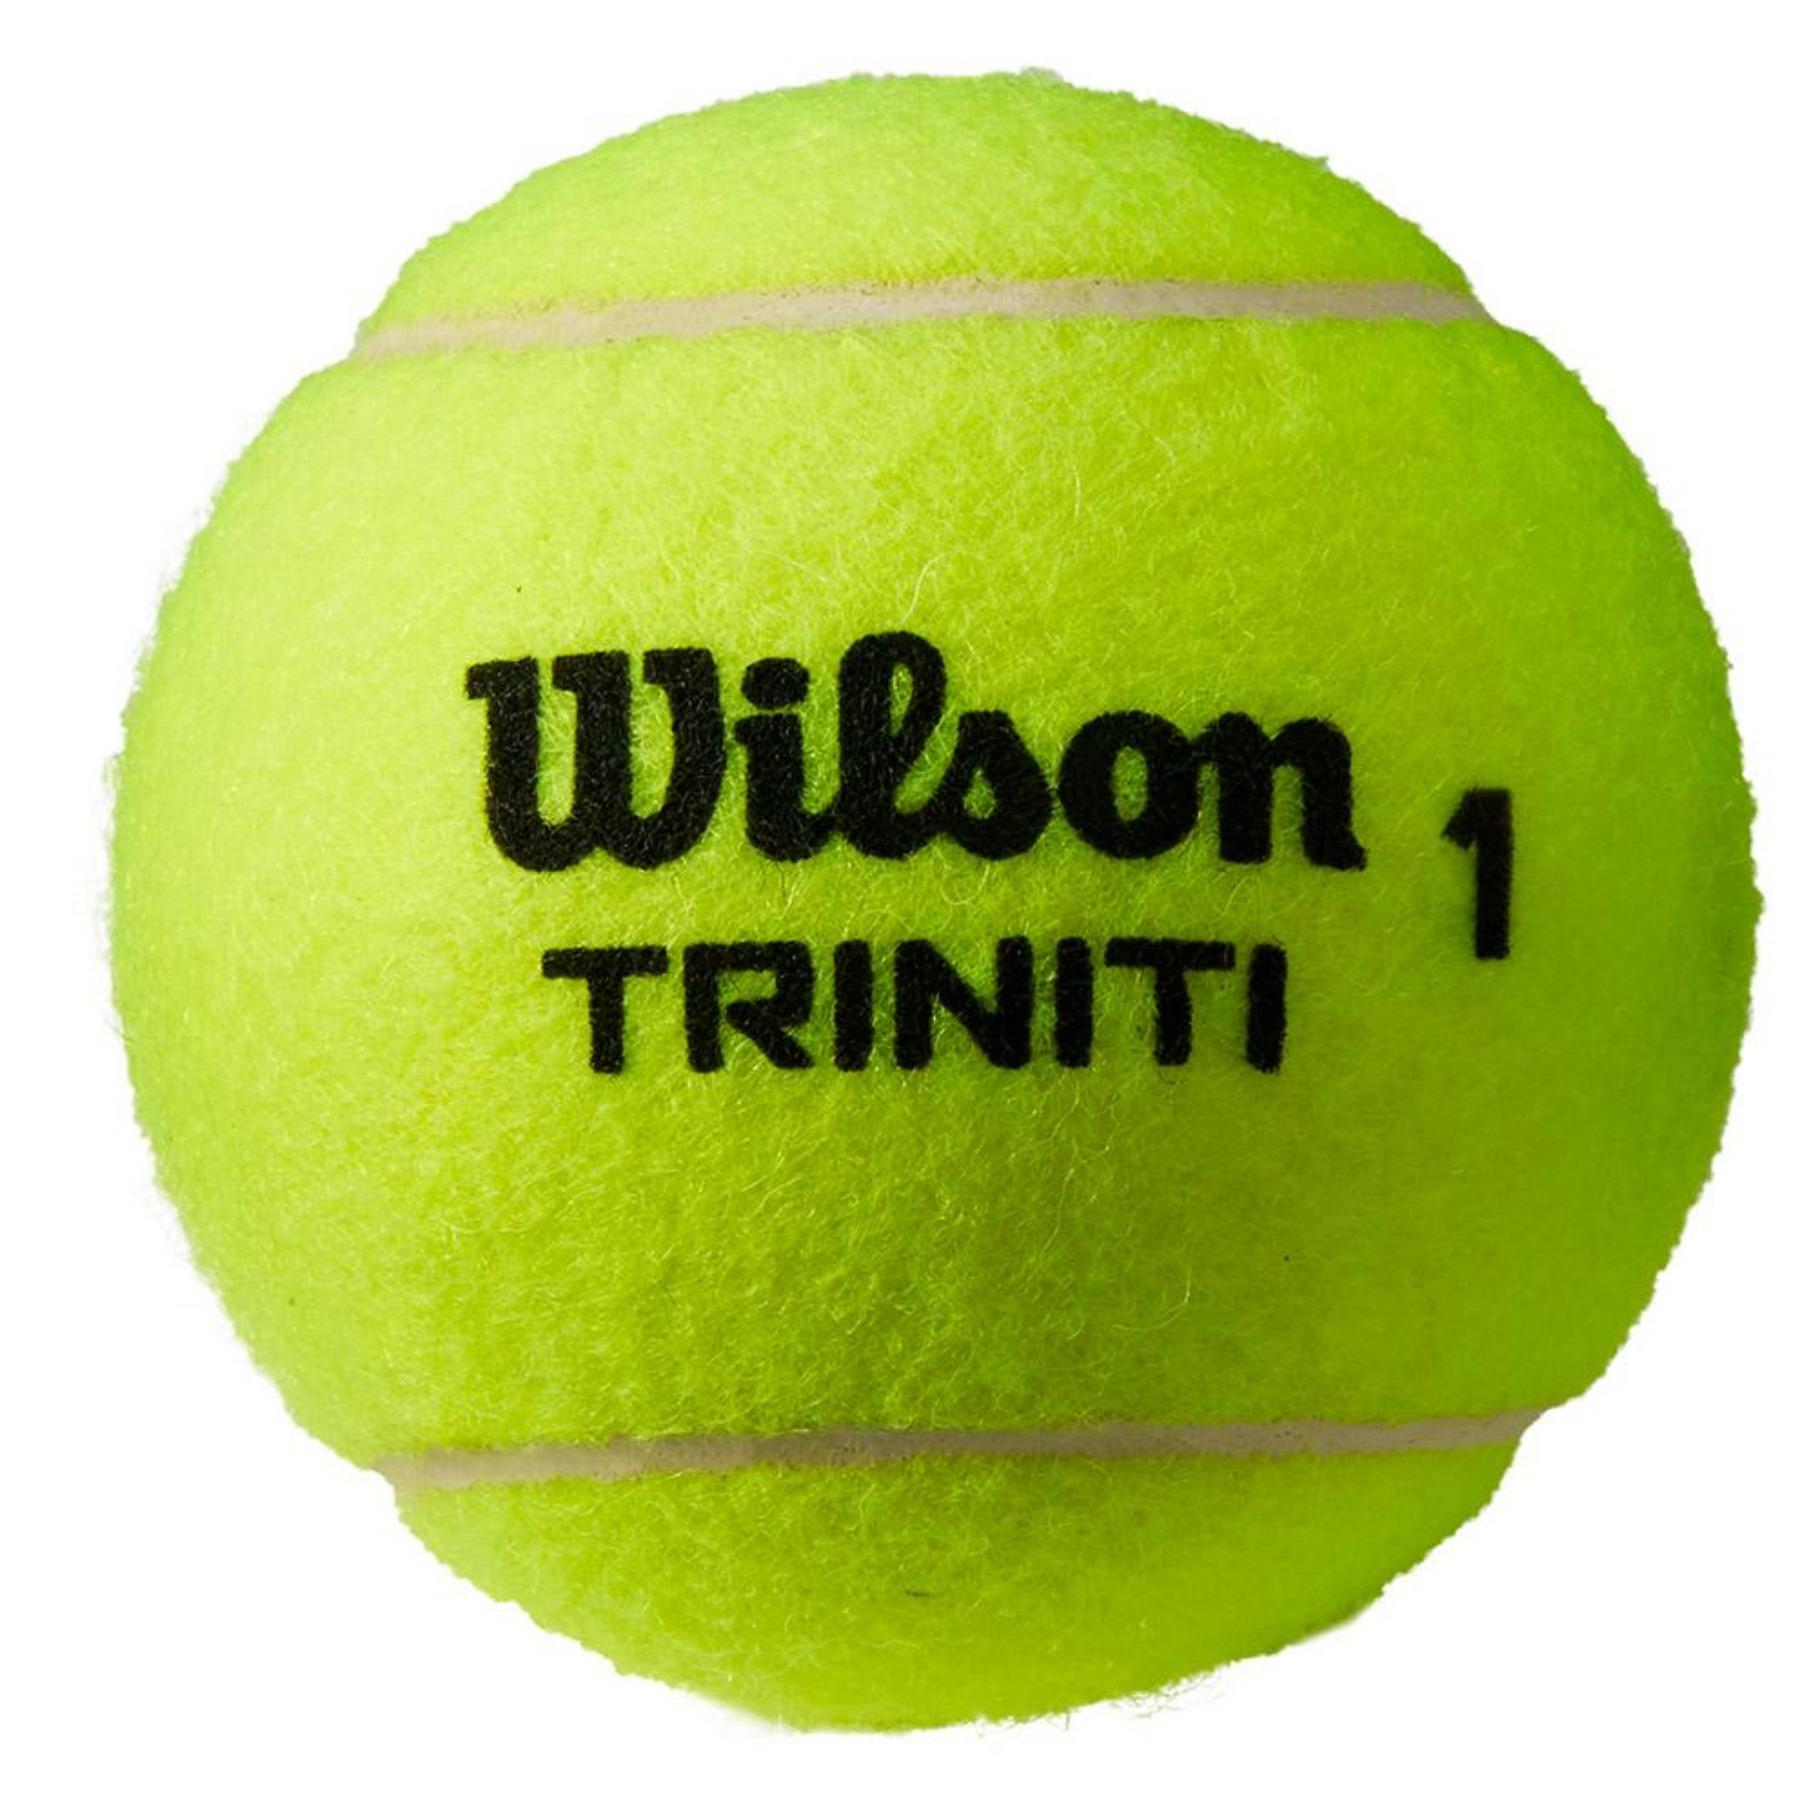 Wilson Triniti All Court Tennis Ball - Can of 3 Balls